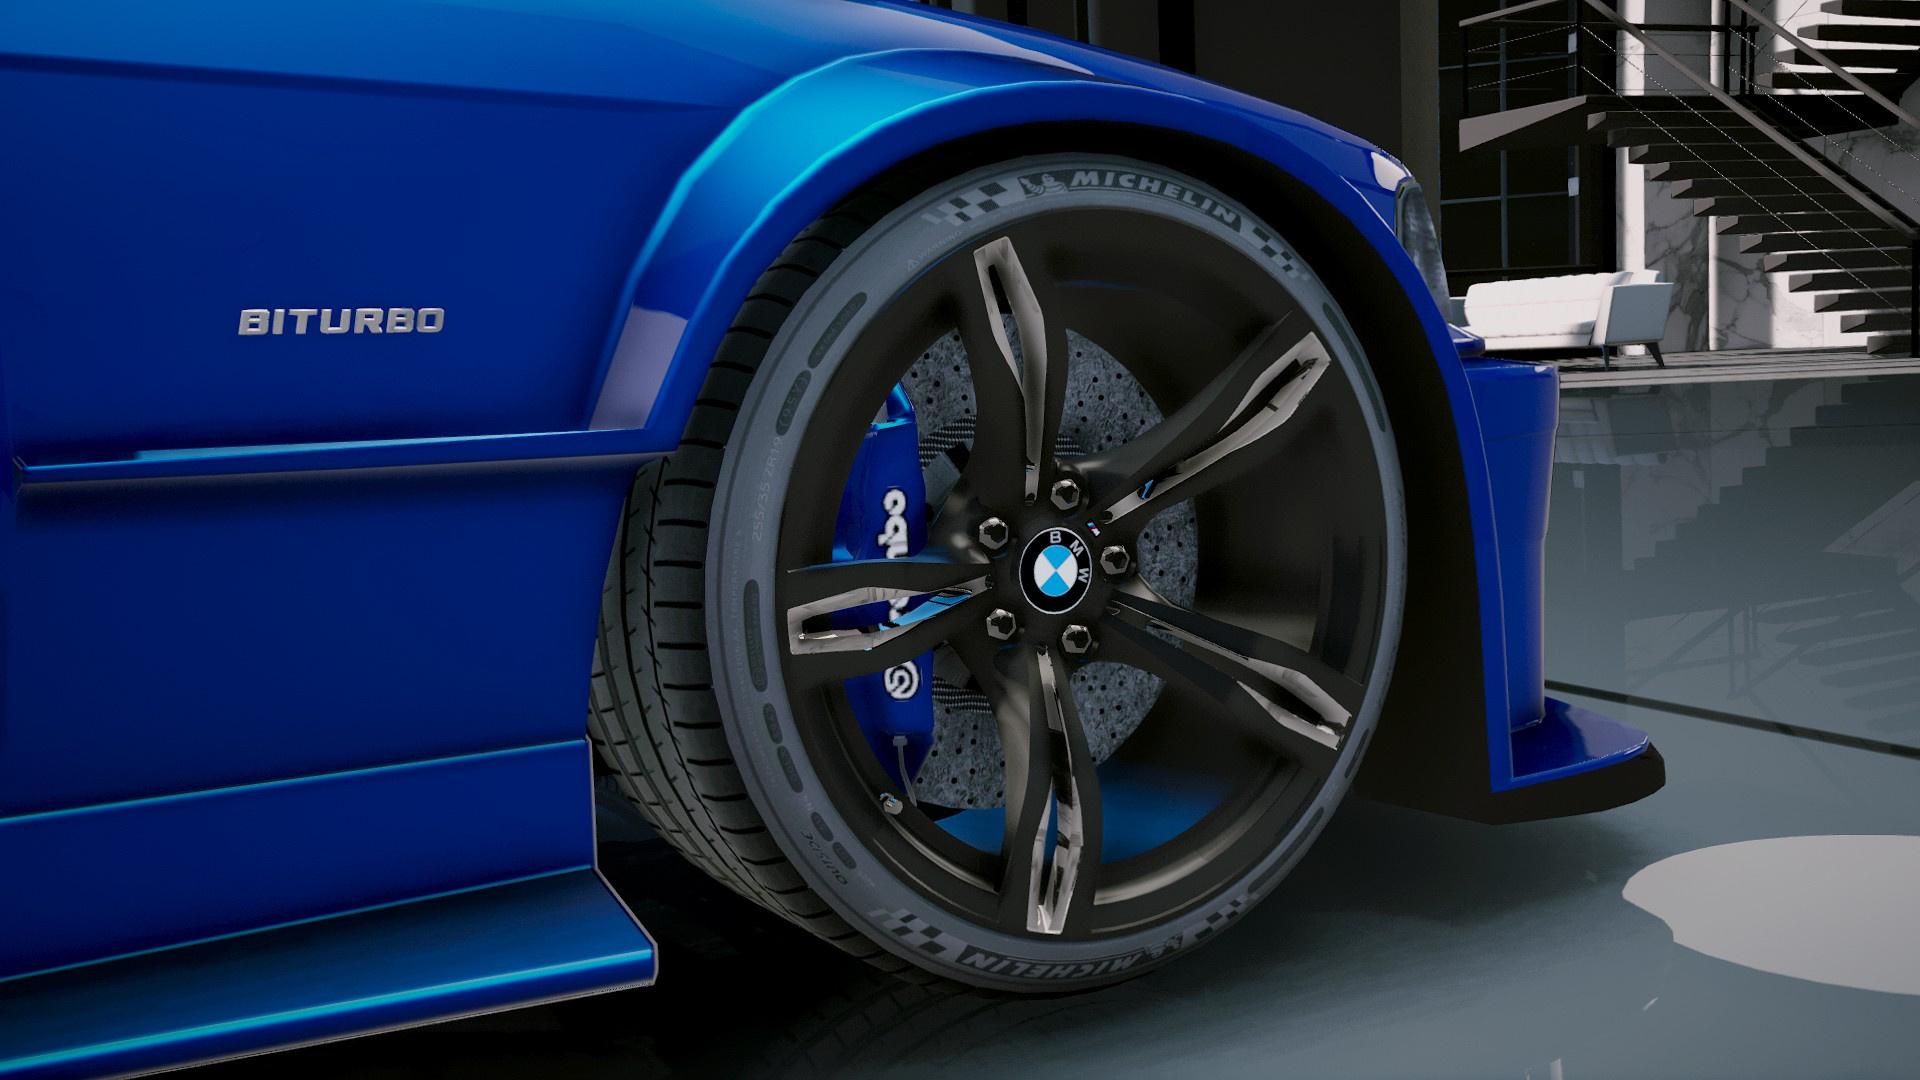 Bmw M3 E36 V8 Biturbo Add On Tuning Gta5 Mods Com